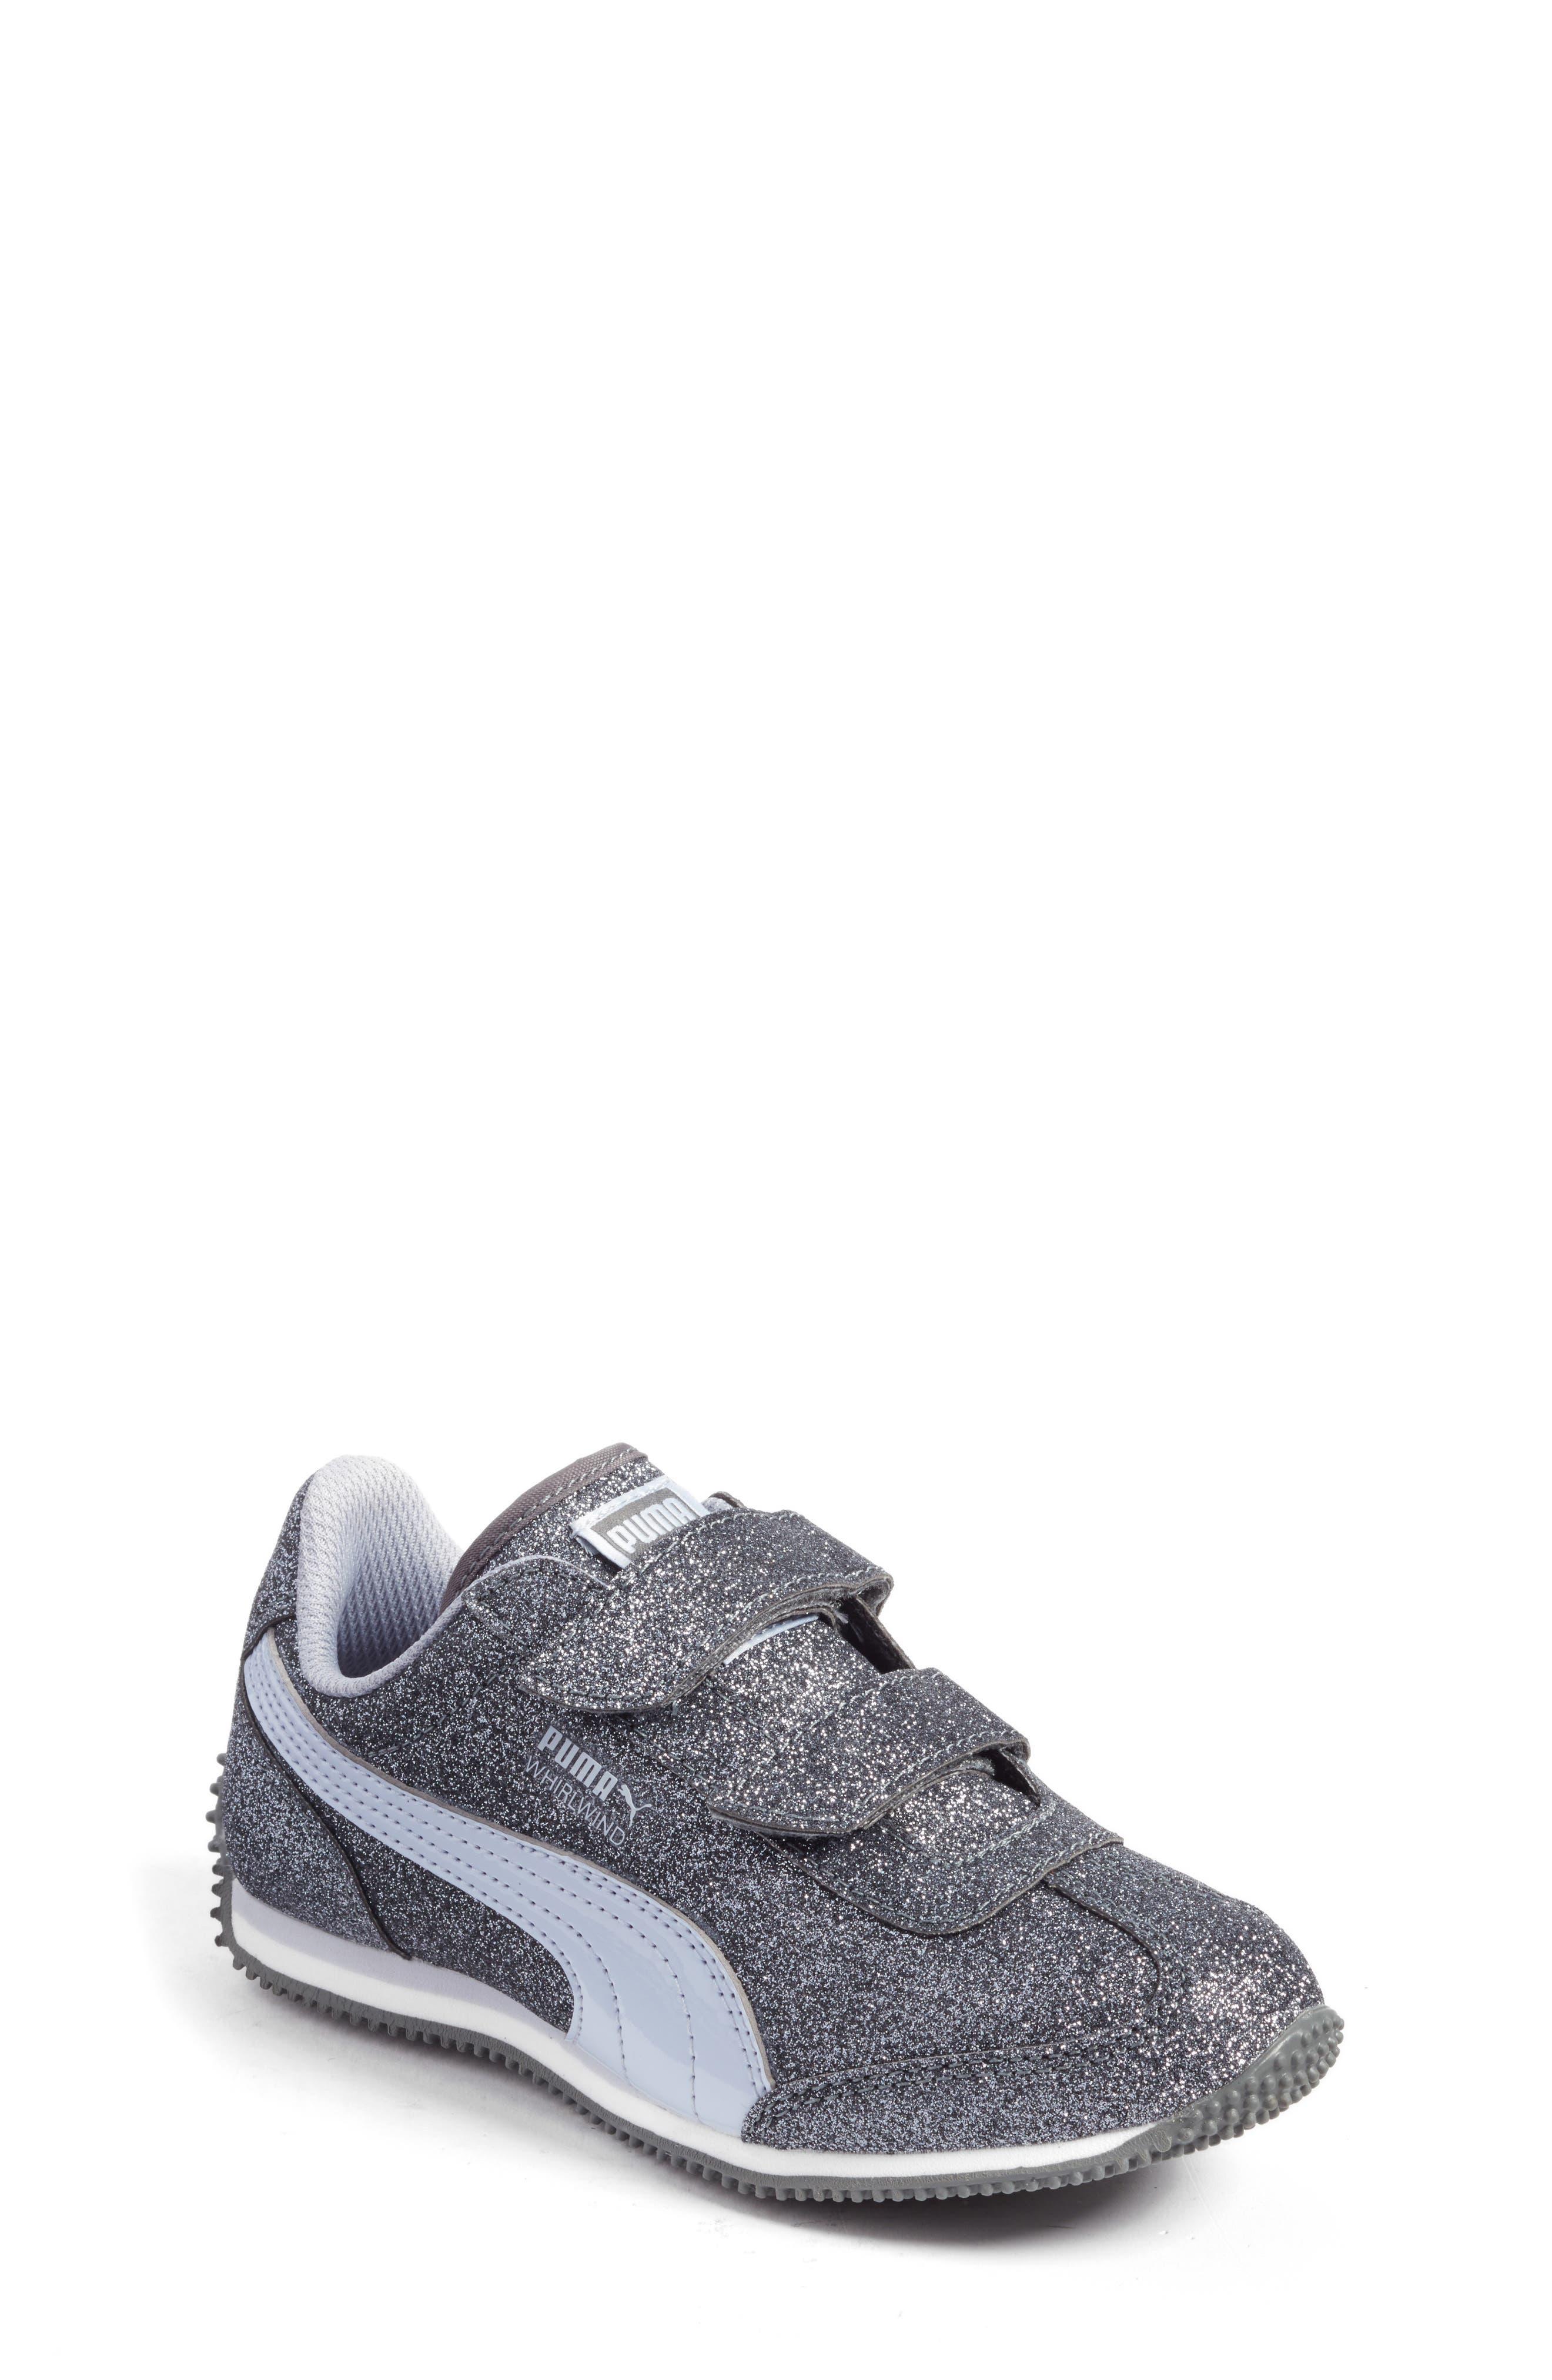 Whirlwind Glitz Sneaker,                         Main,                         color, 400